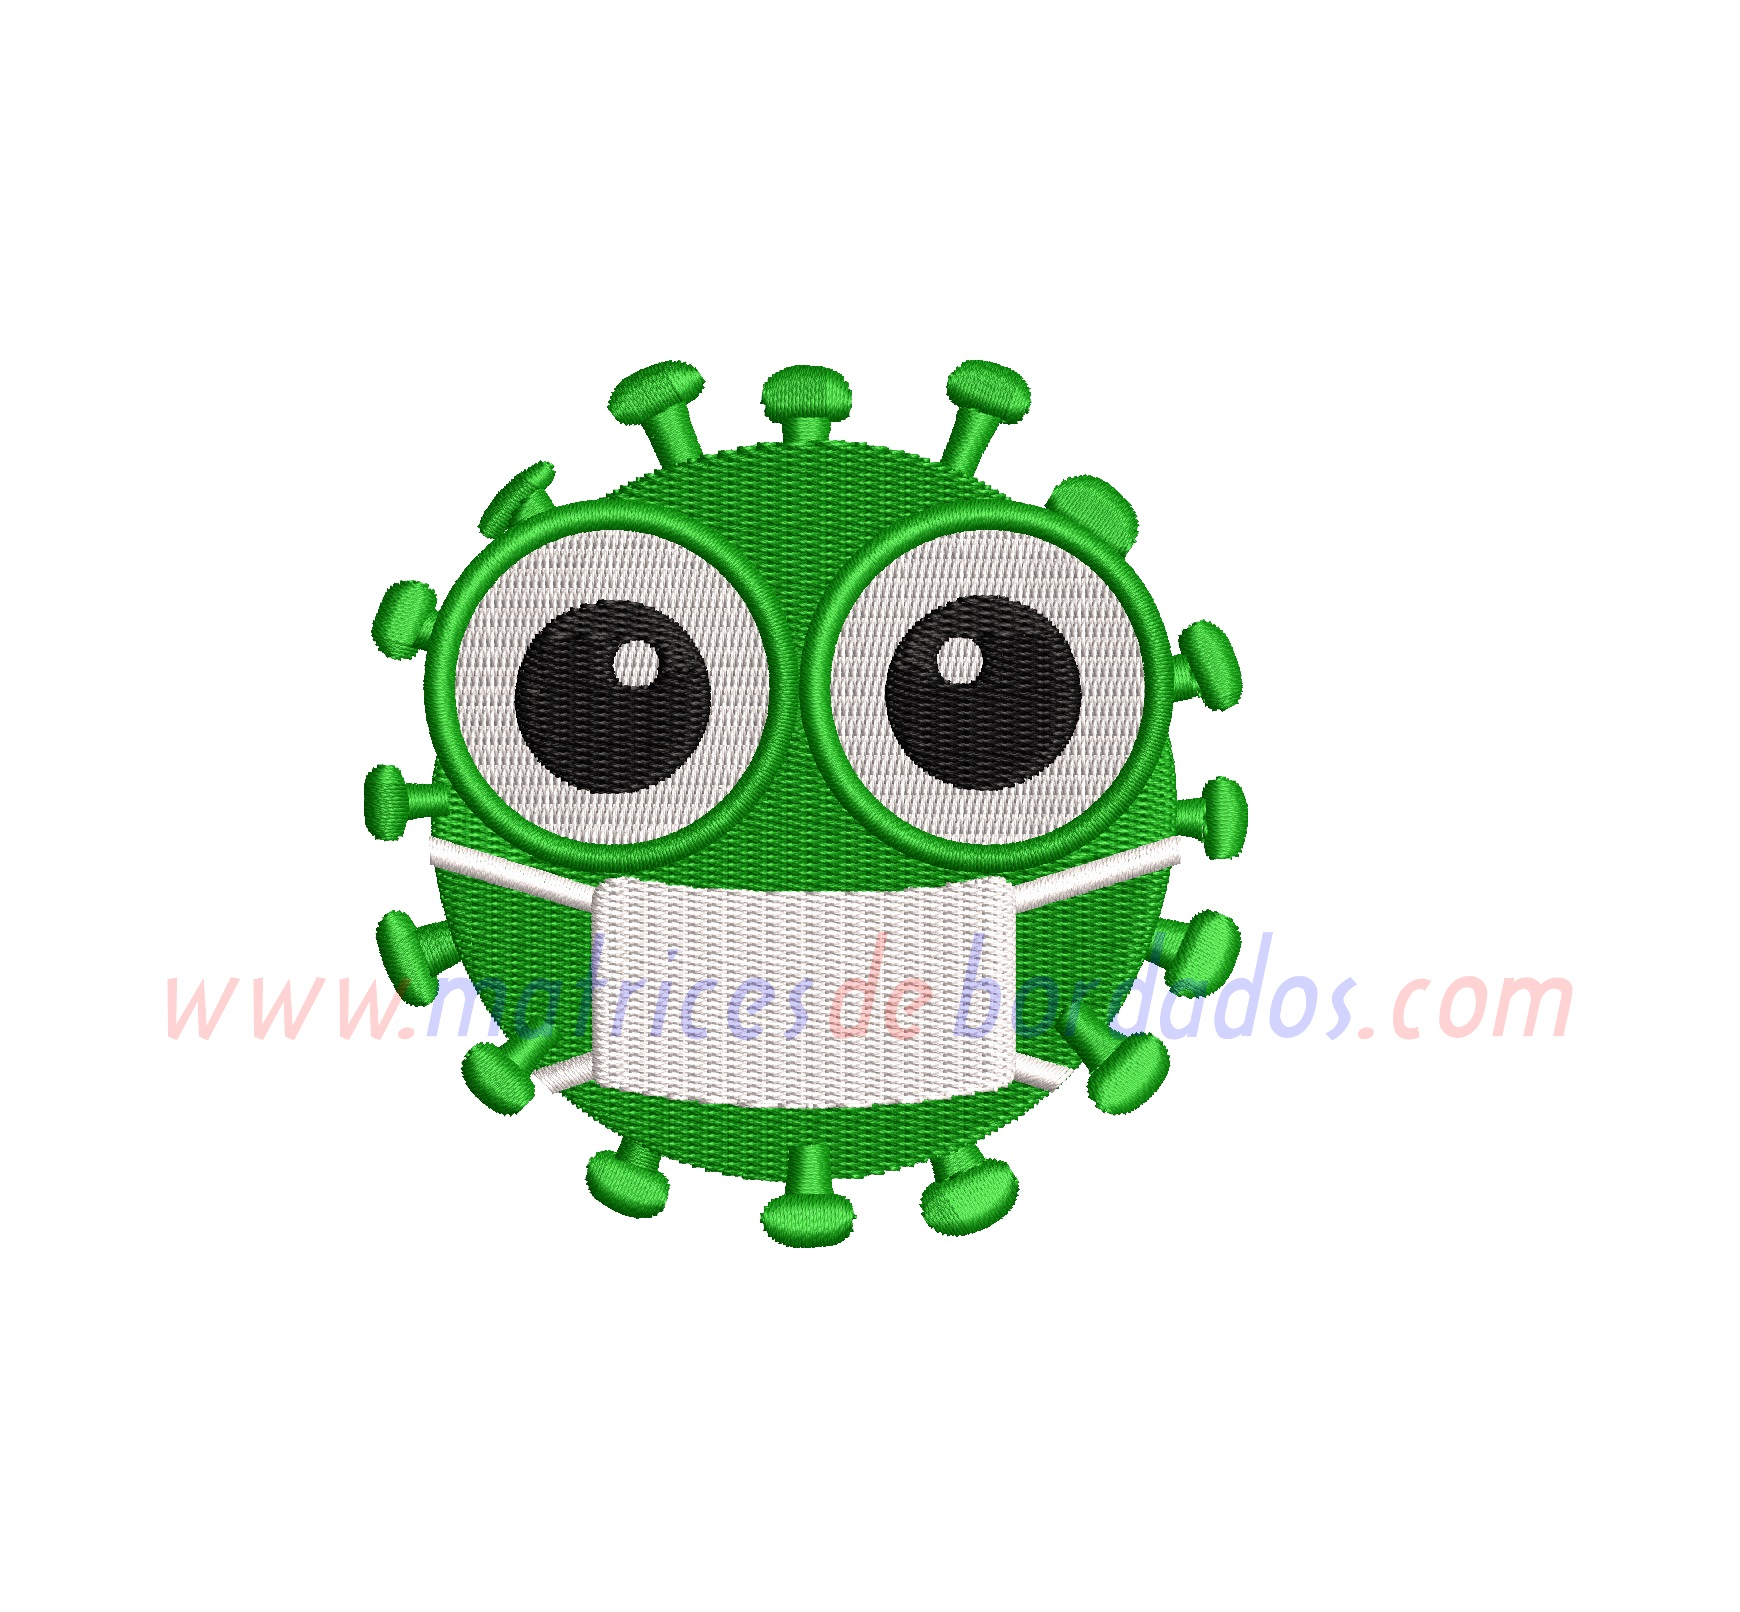 KS23KM - Virus